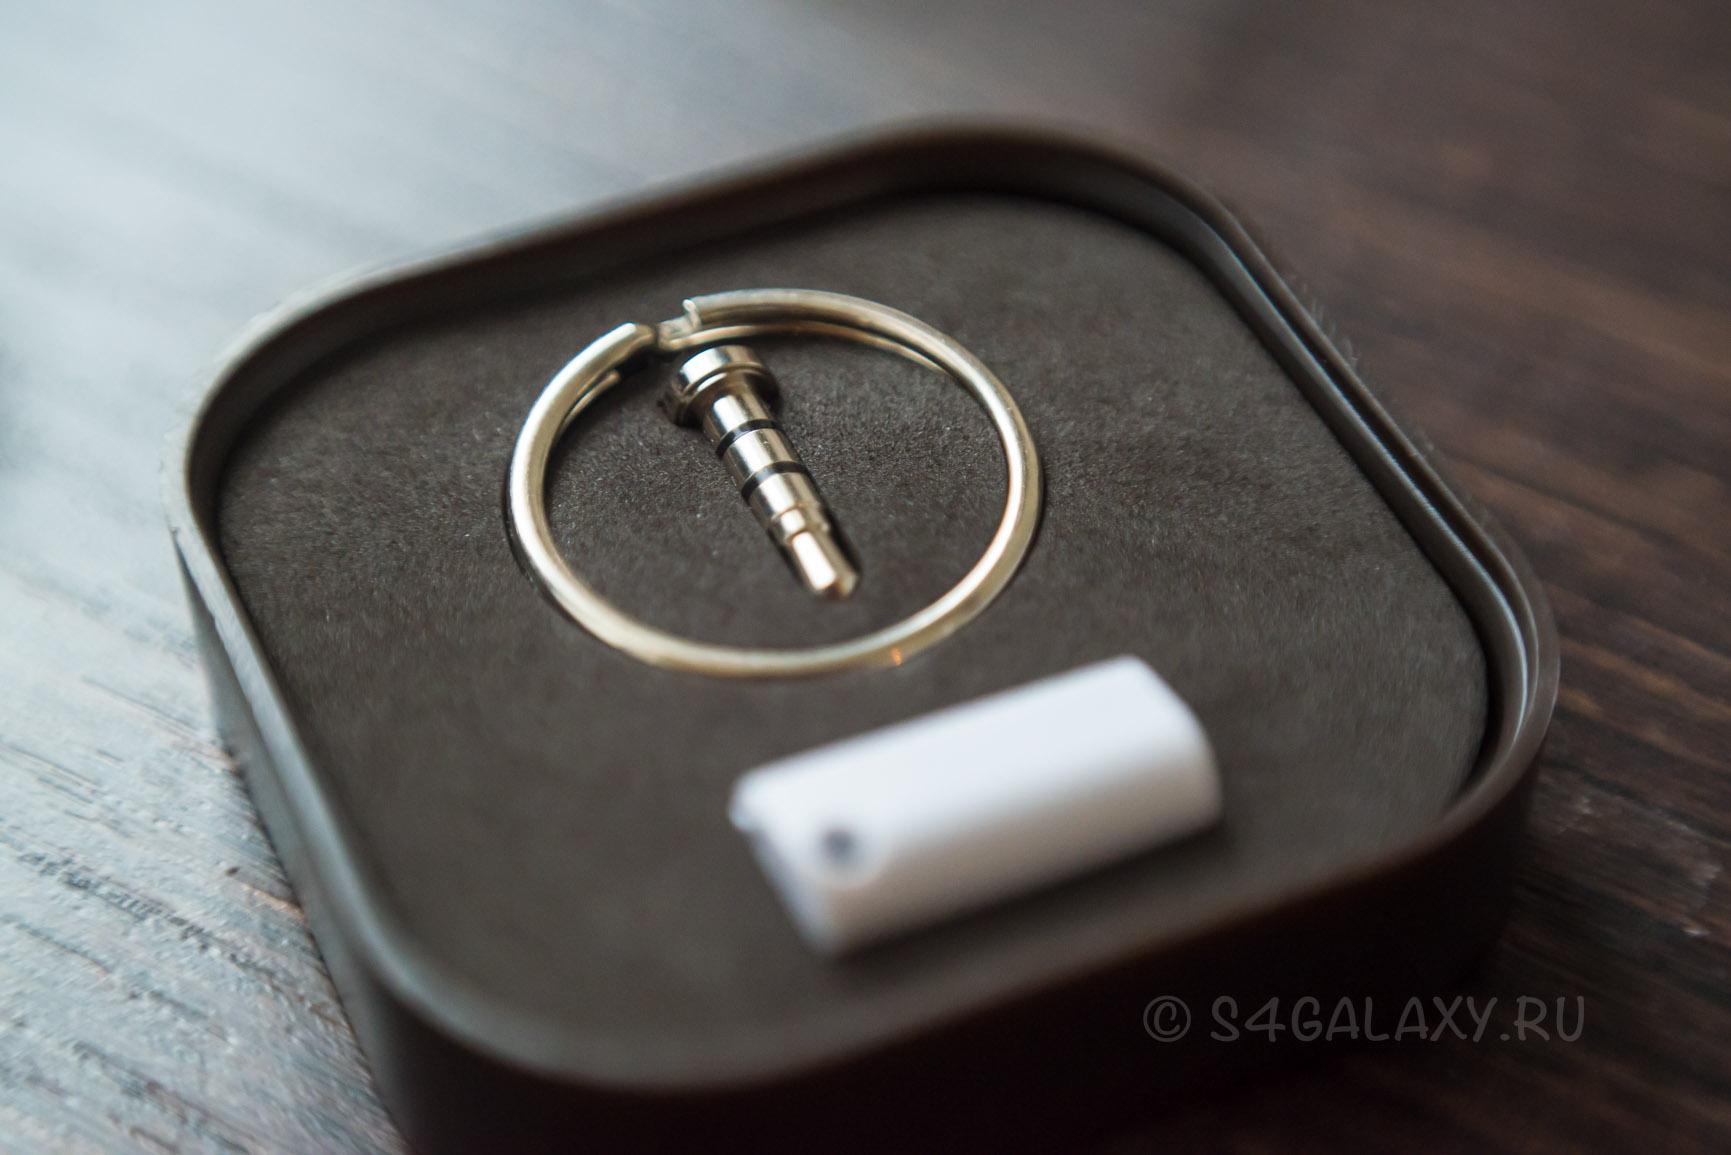 Кнопка Let's Klick - кнопка-ярлык на Самсунг